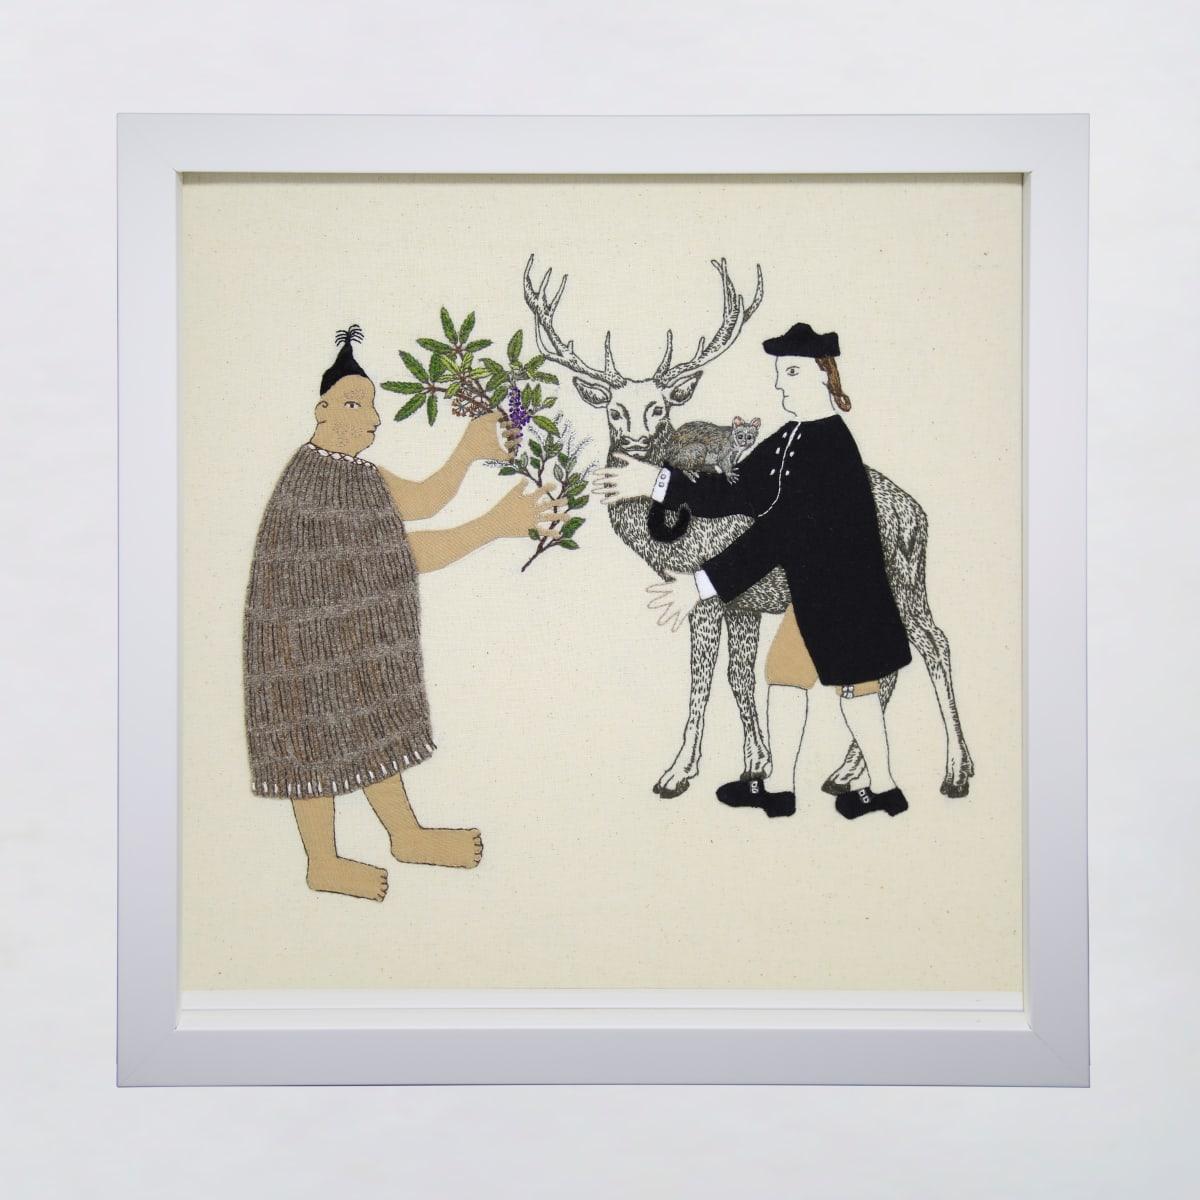 Sarah Munro Trade Items - Understorey, Possum, Deer, 2019 cloth and thread 330mm x 330mm